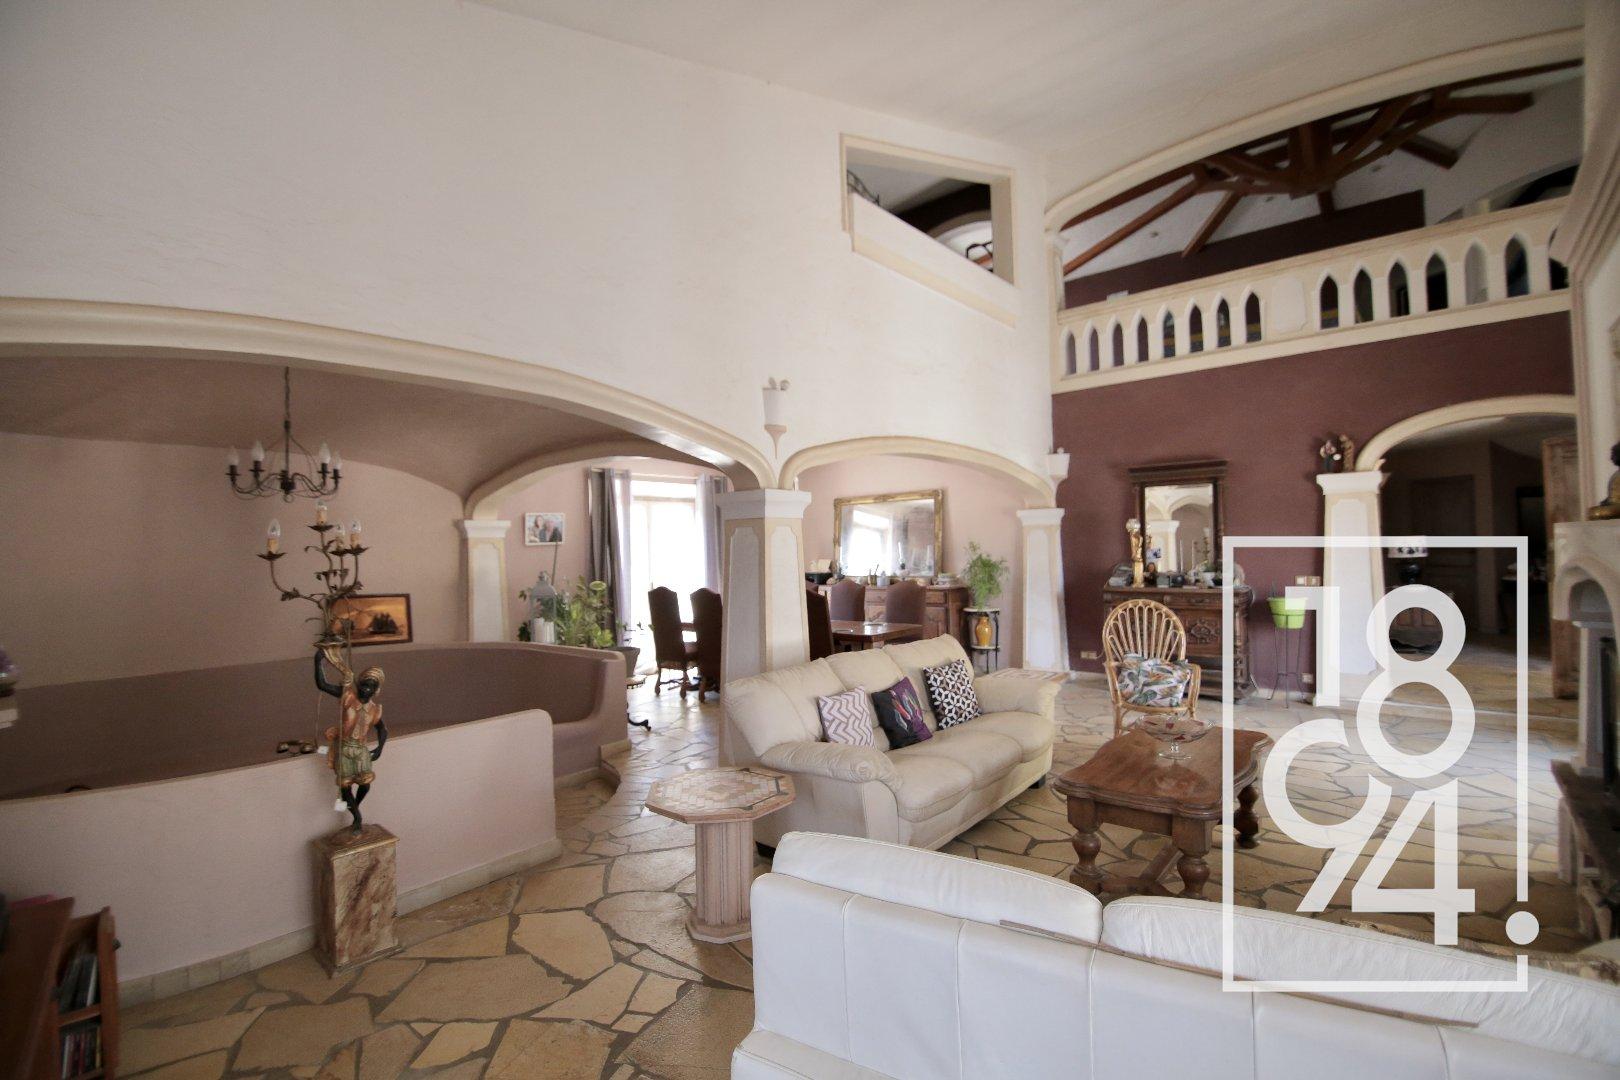 Maison de maçon en pierres Callas